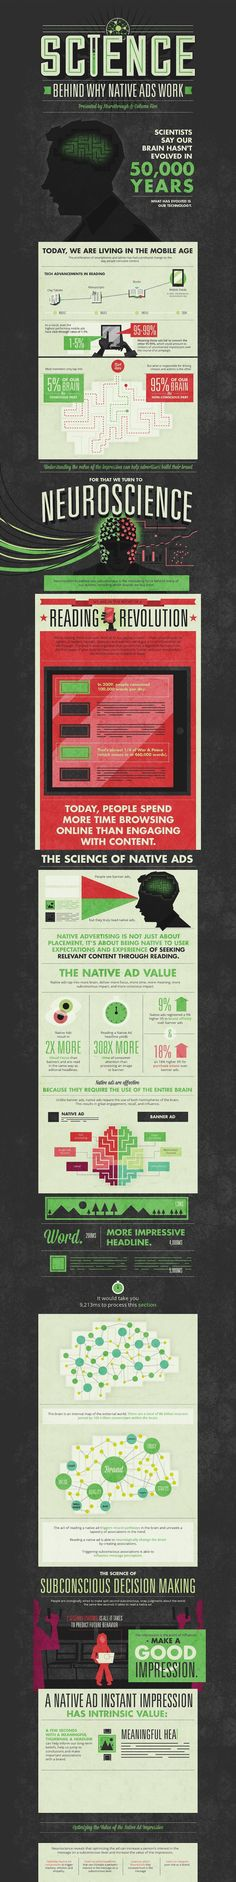 www.makesellgrow.com#socialmedia#tips